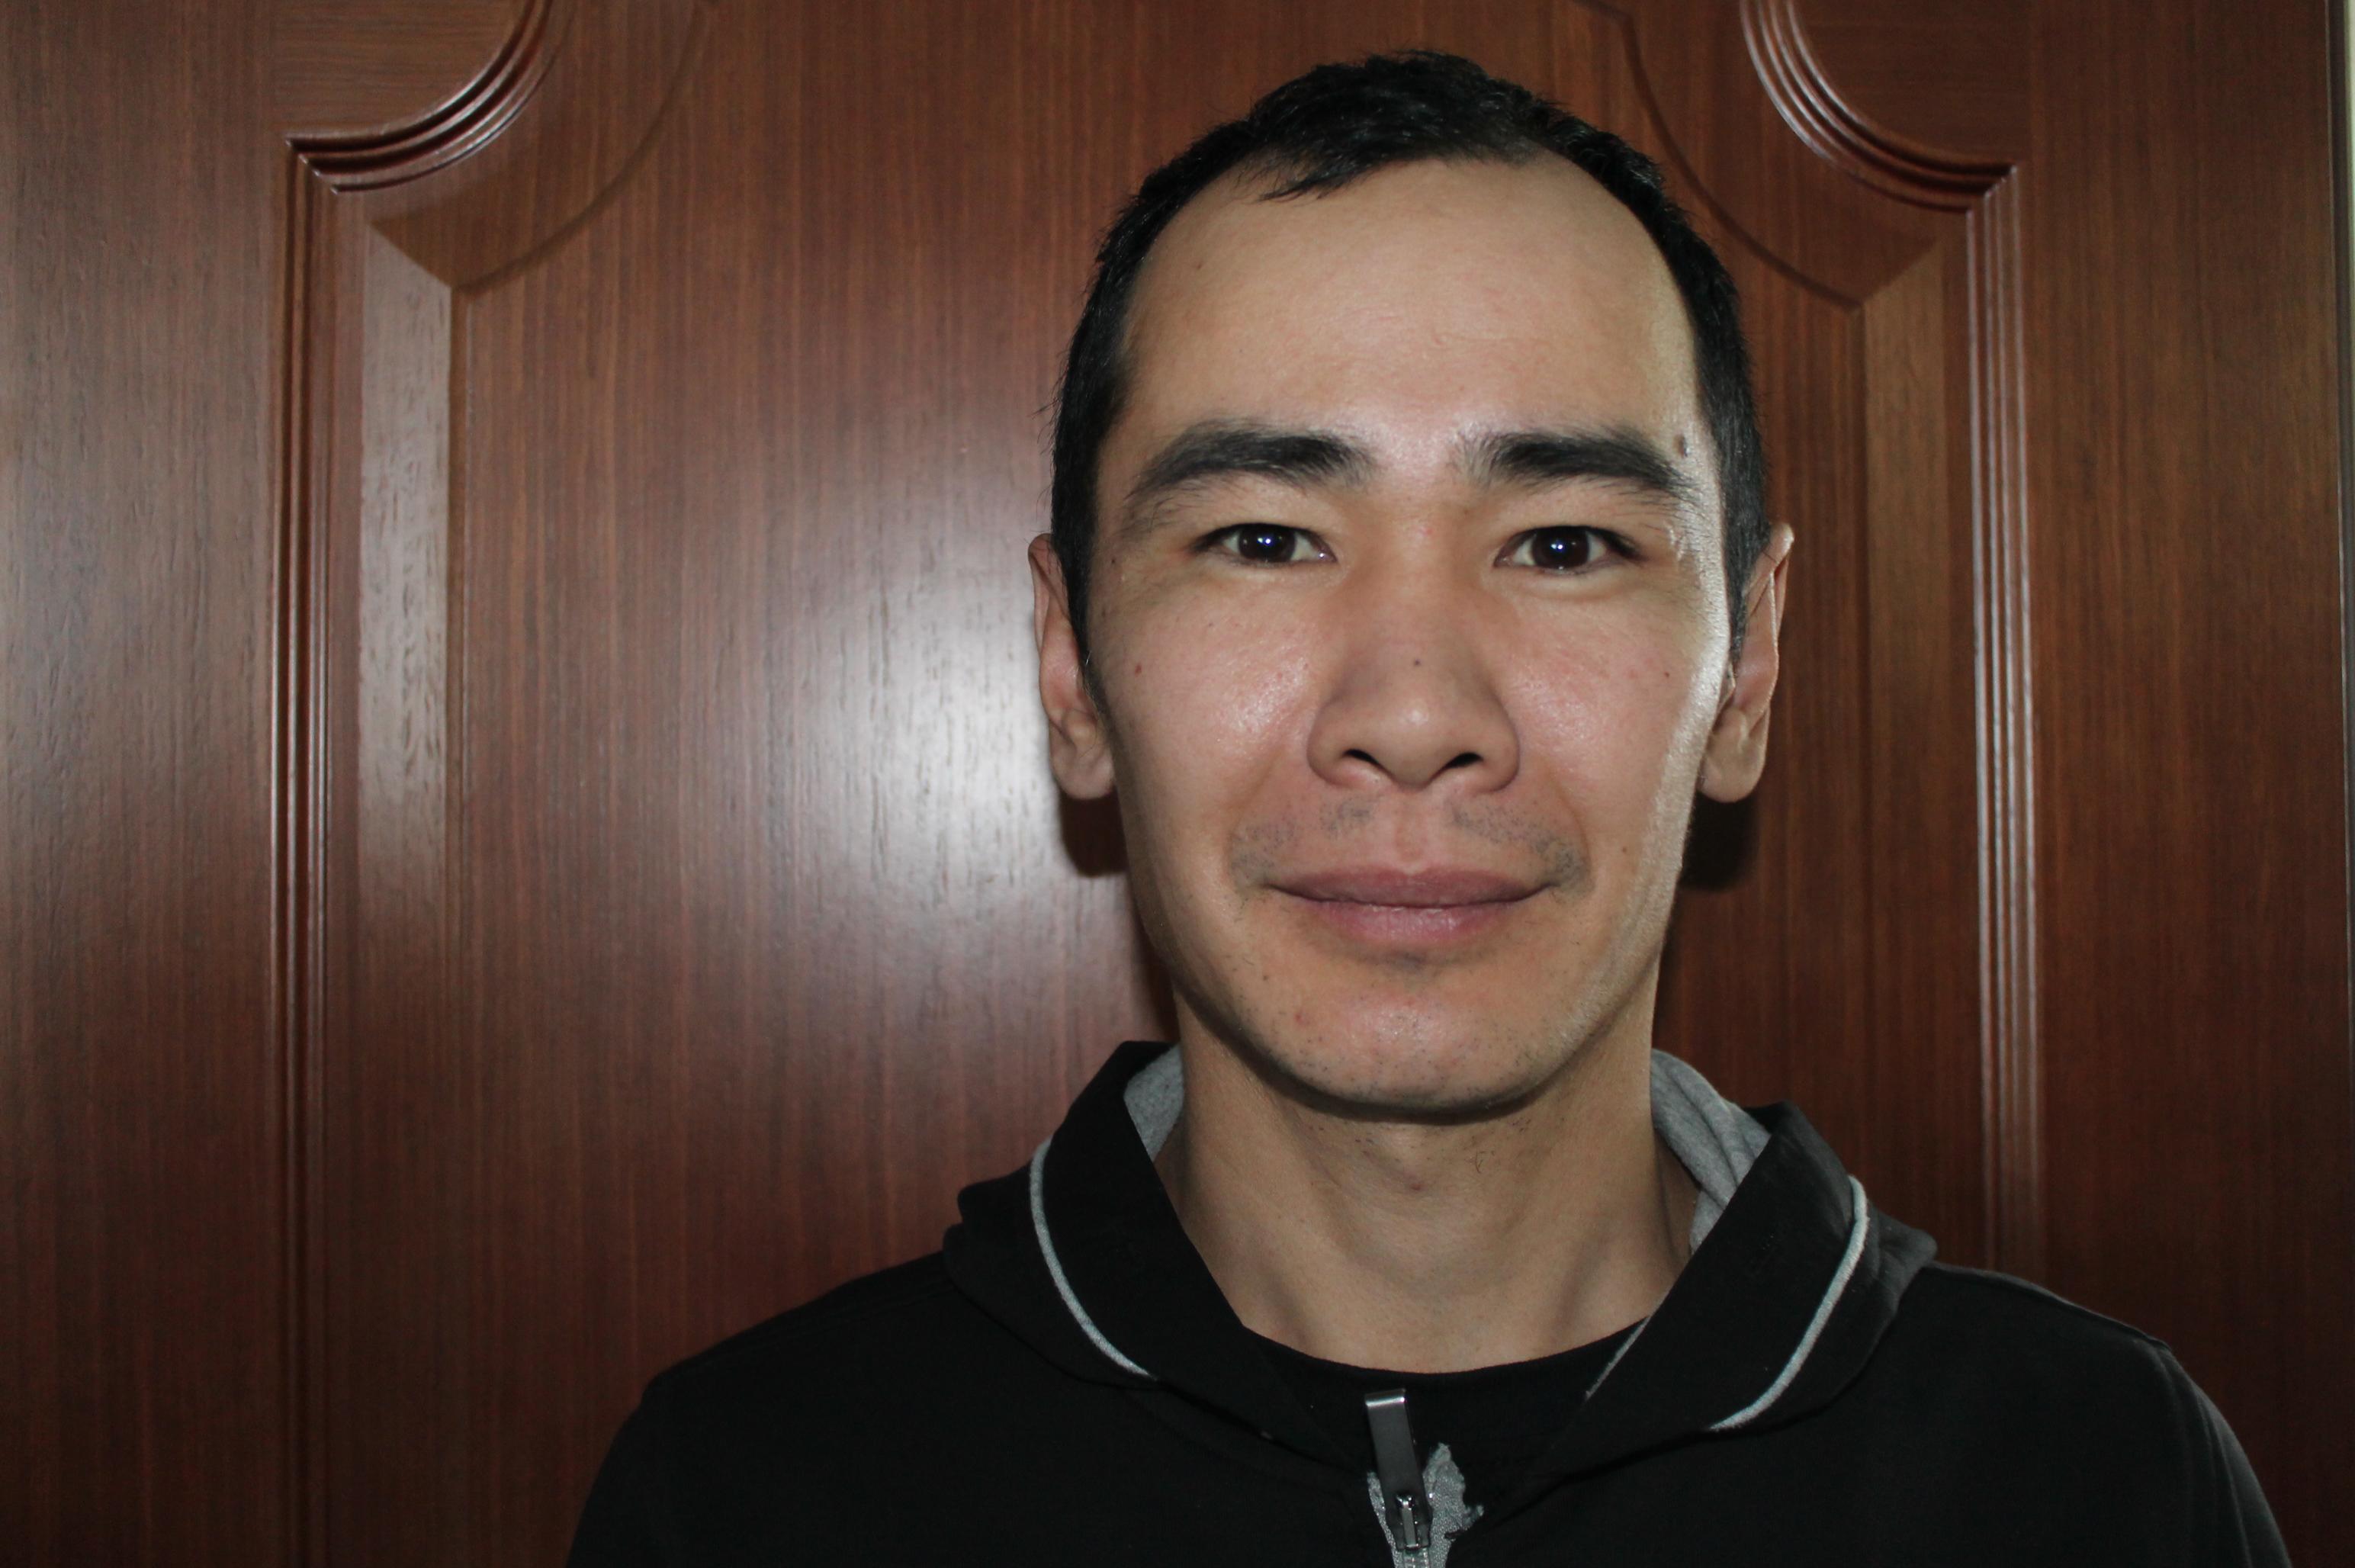 Ширяев Василий,студент группы ЭМС-3